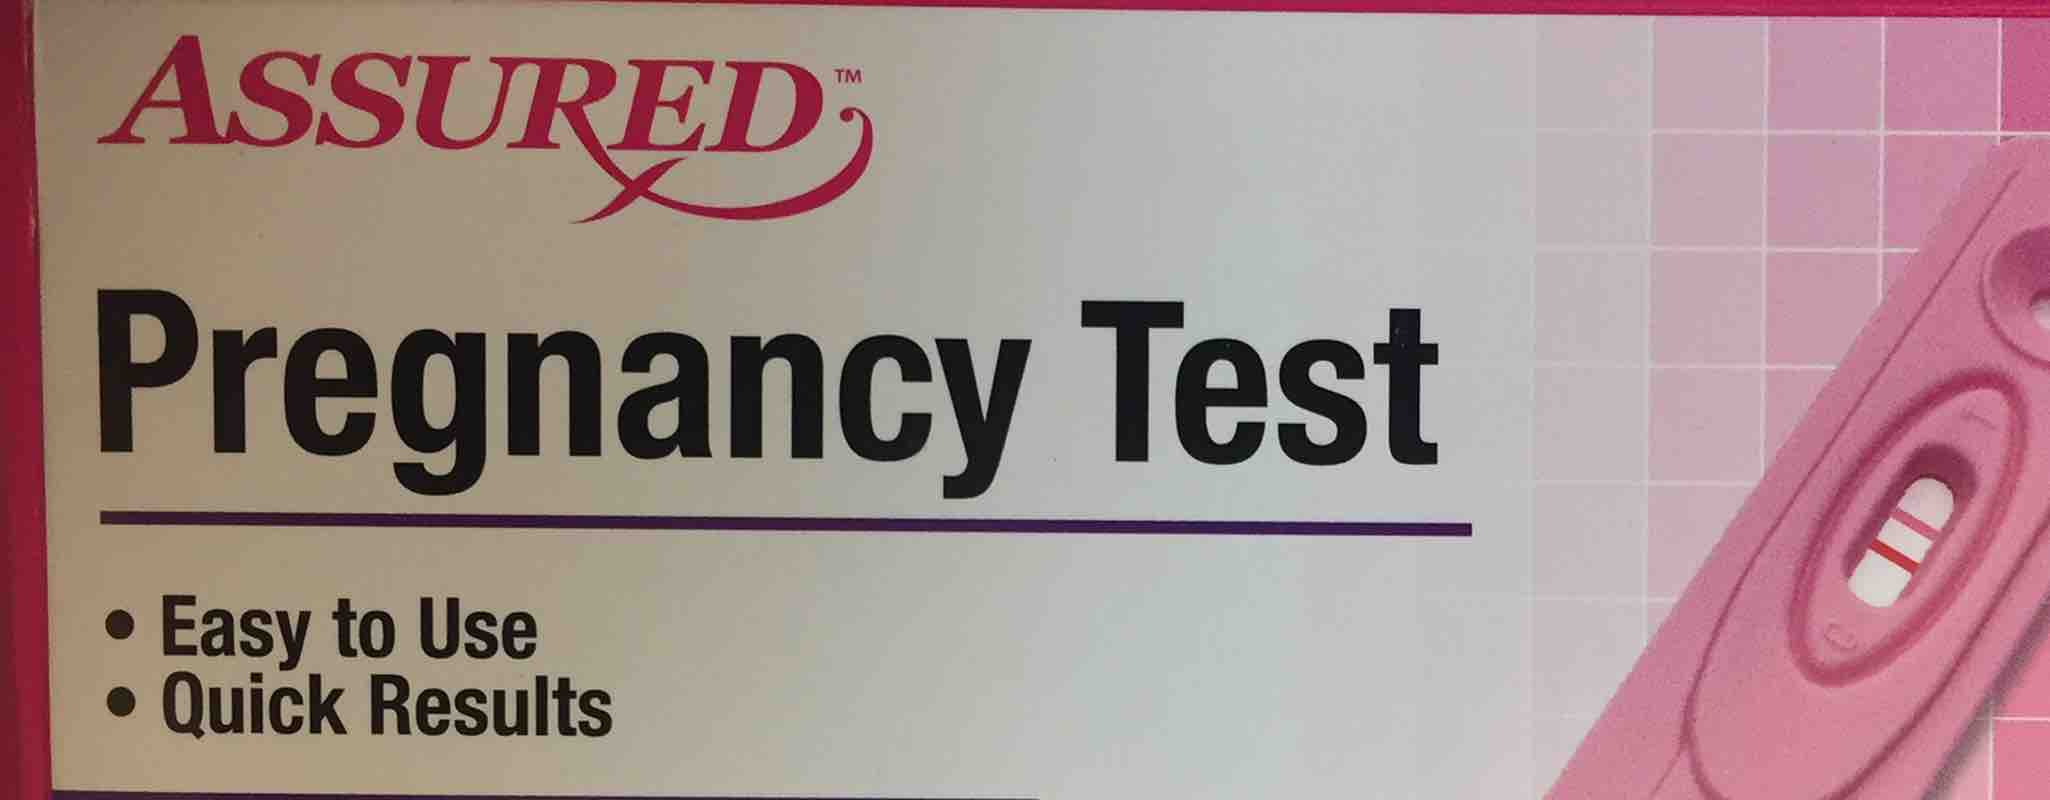 Assured Pregnancy Test sensitivity 2018